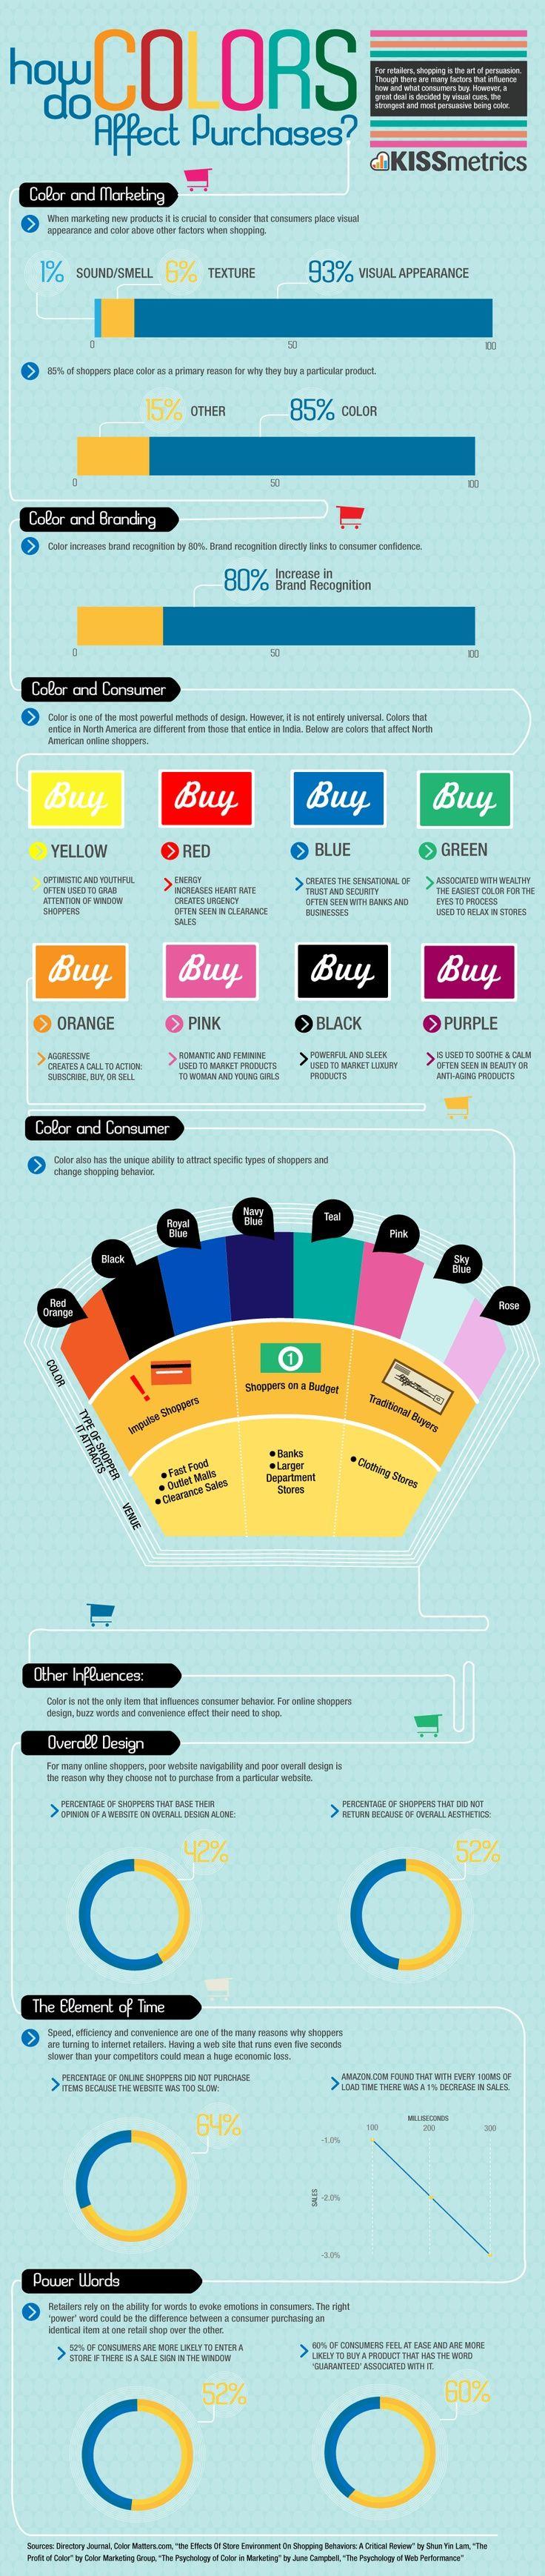 Renkler ve Pazarlama - color-purchases-lrg.gif (1000×4725)